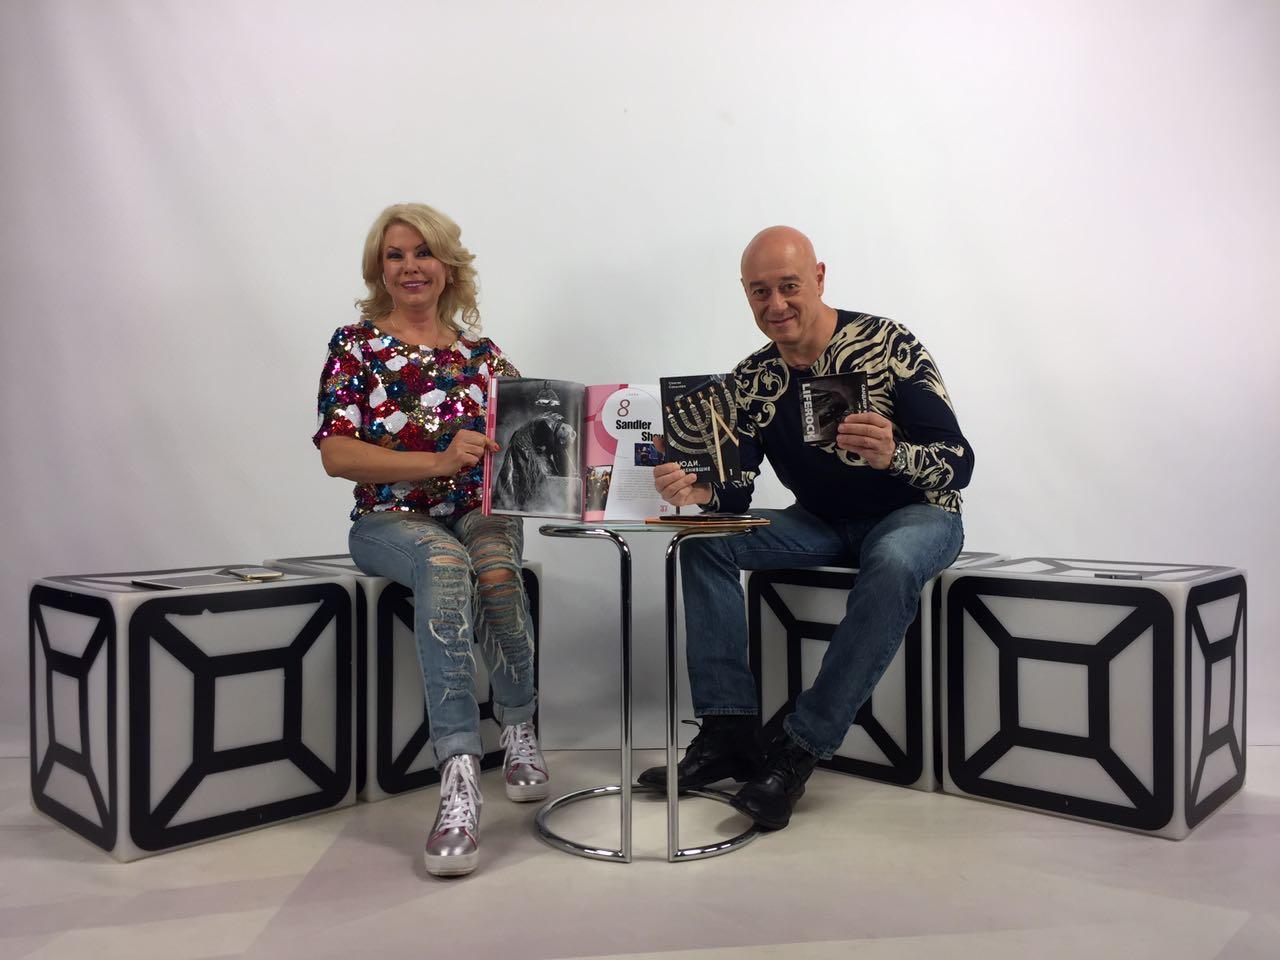 sandler musicbox - часовая программа об Игоре Сандлере на телеканале MusicBox!